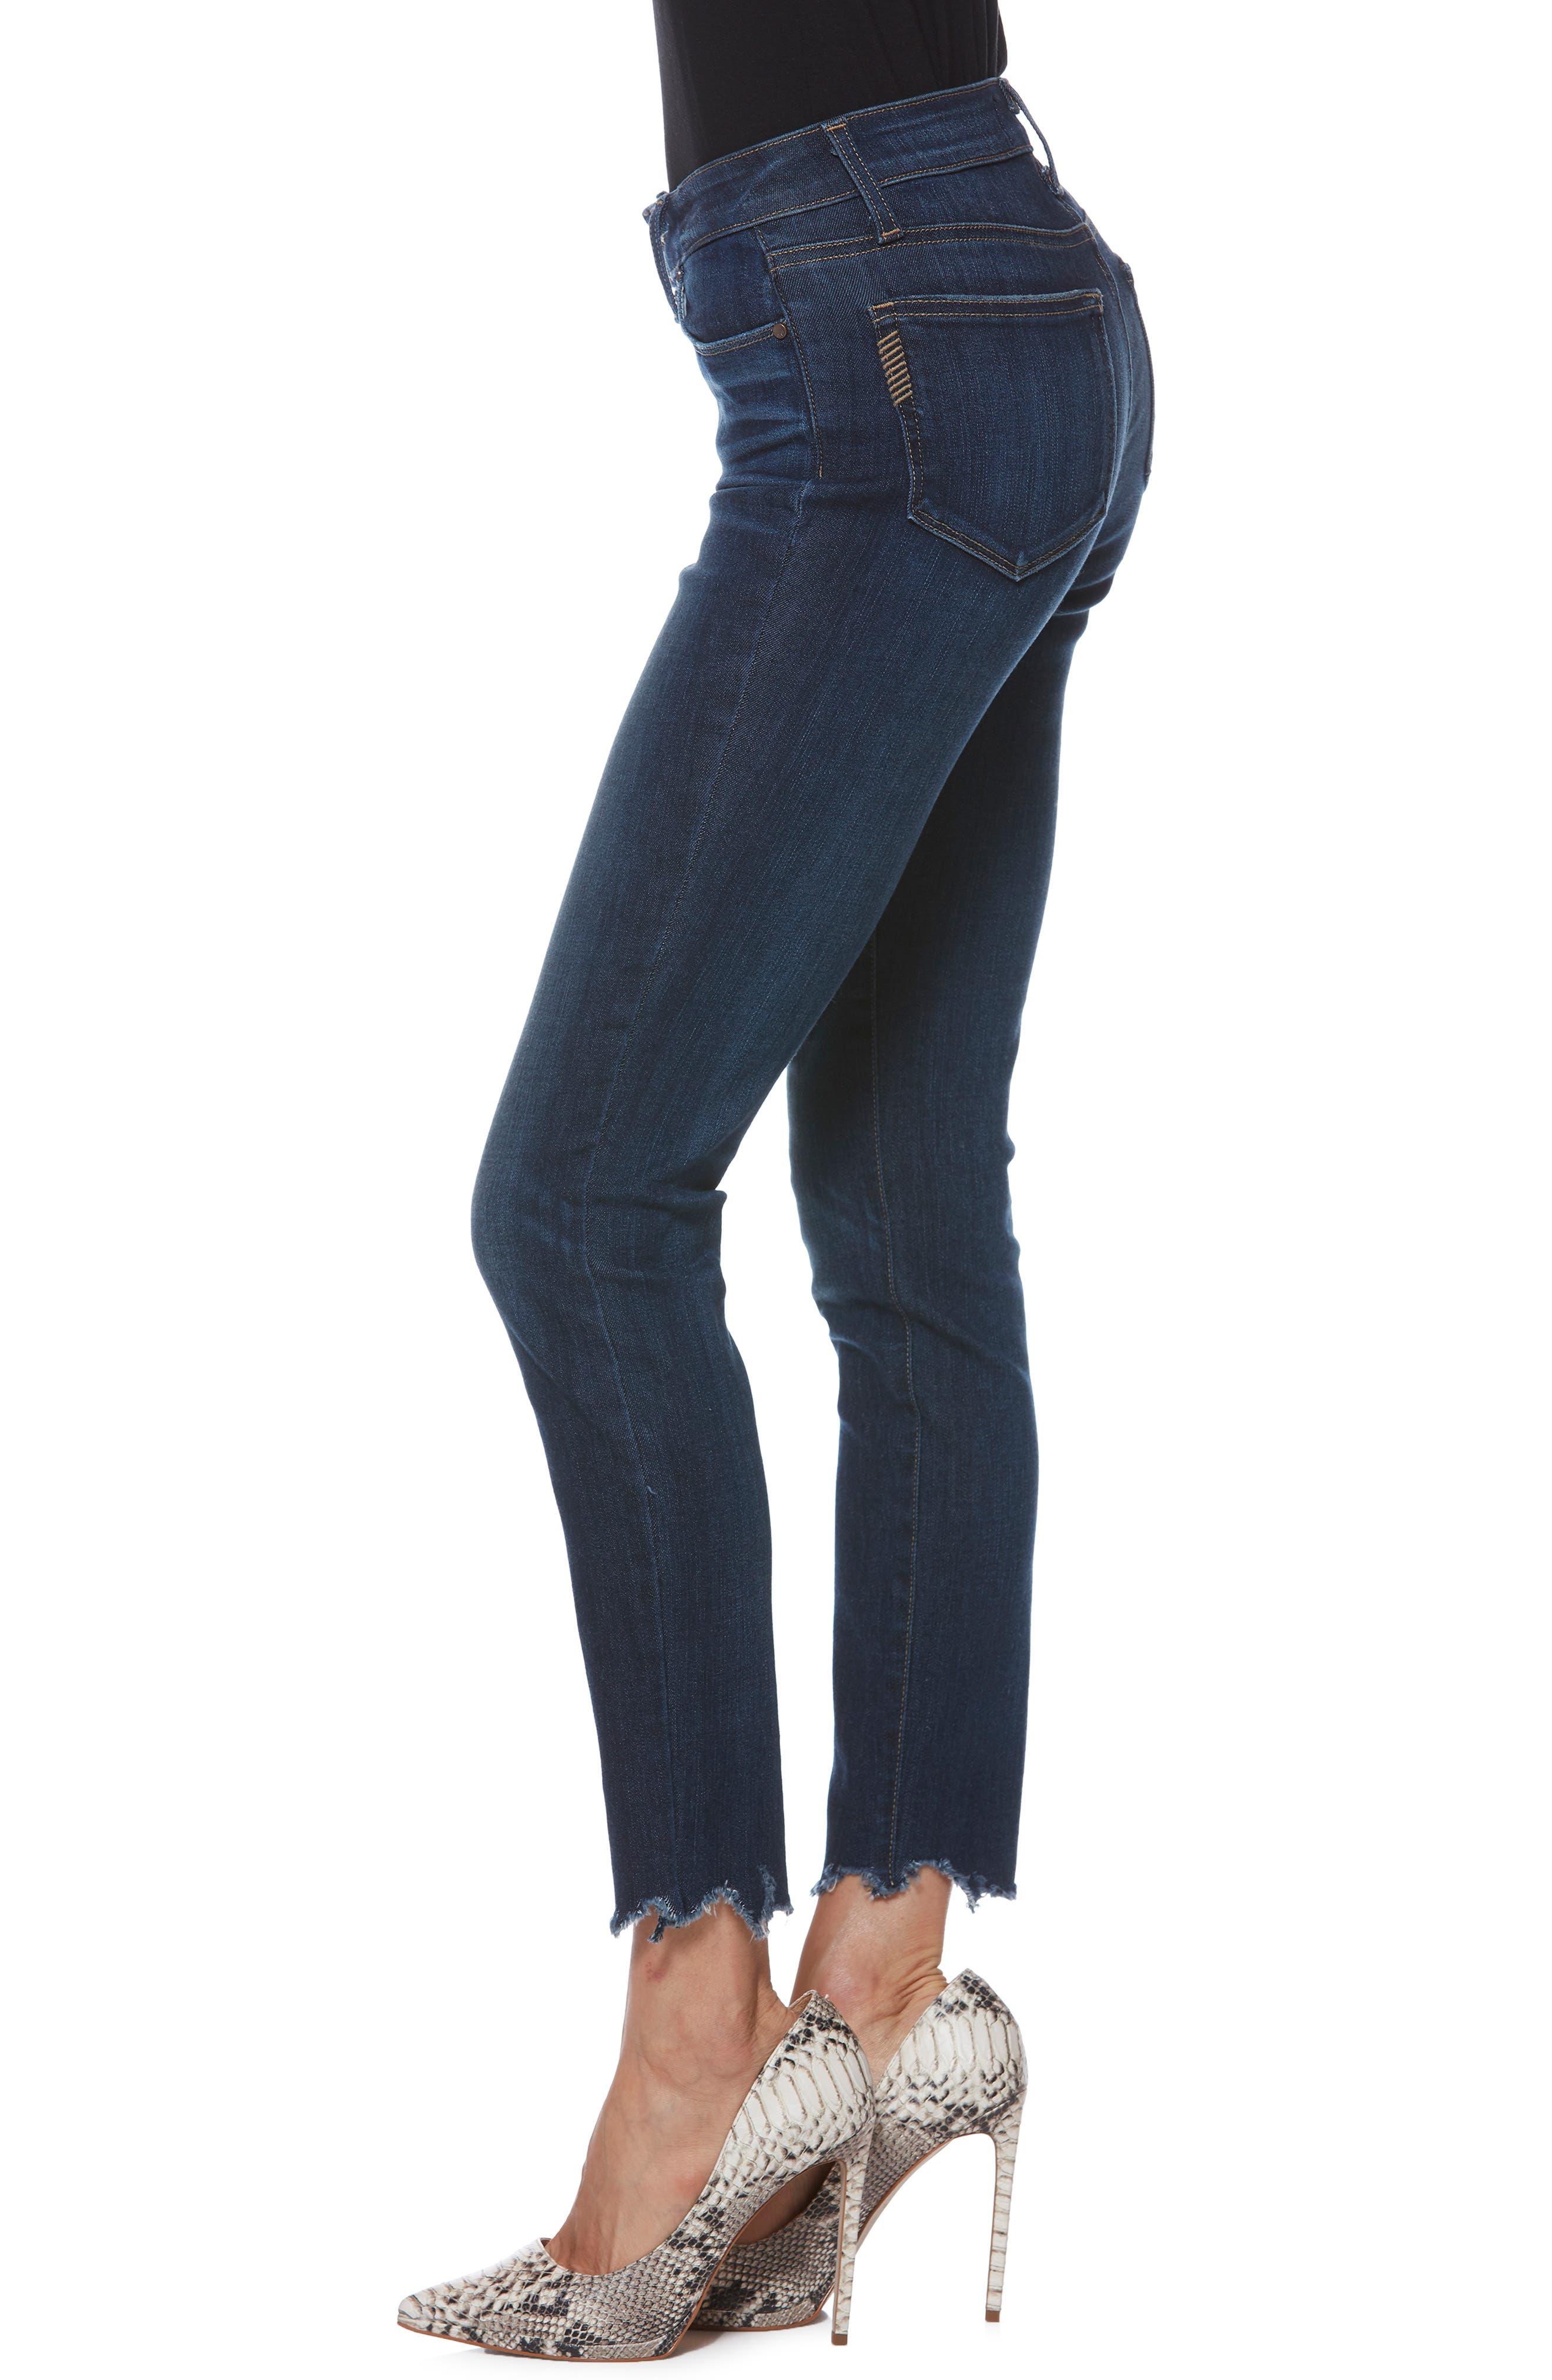 Verdugo Transcend Vintage Ankle Skinny Jeans,                             Alternate thumbnail 3, color,                             400